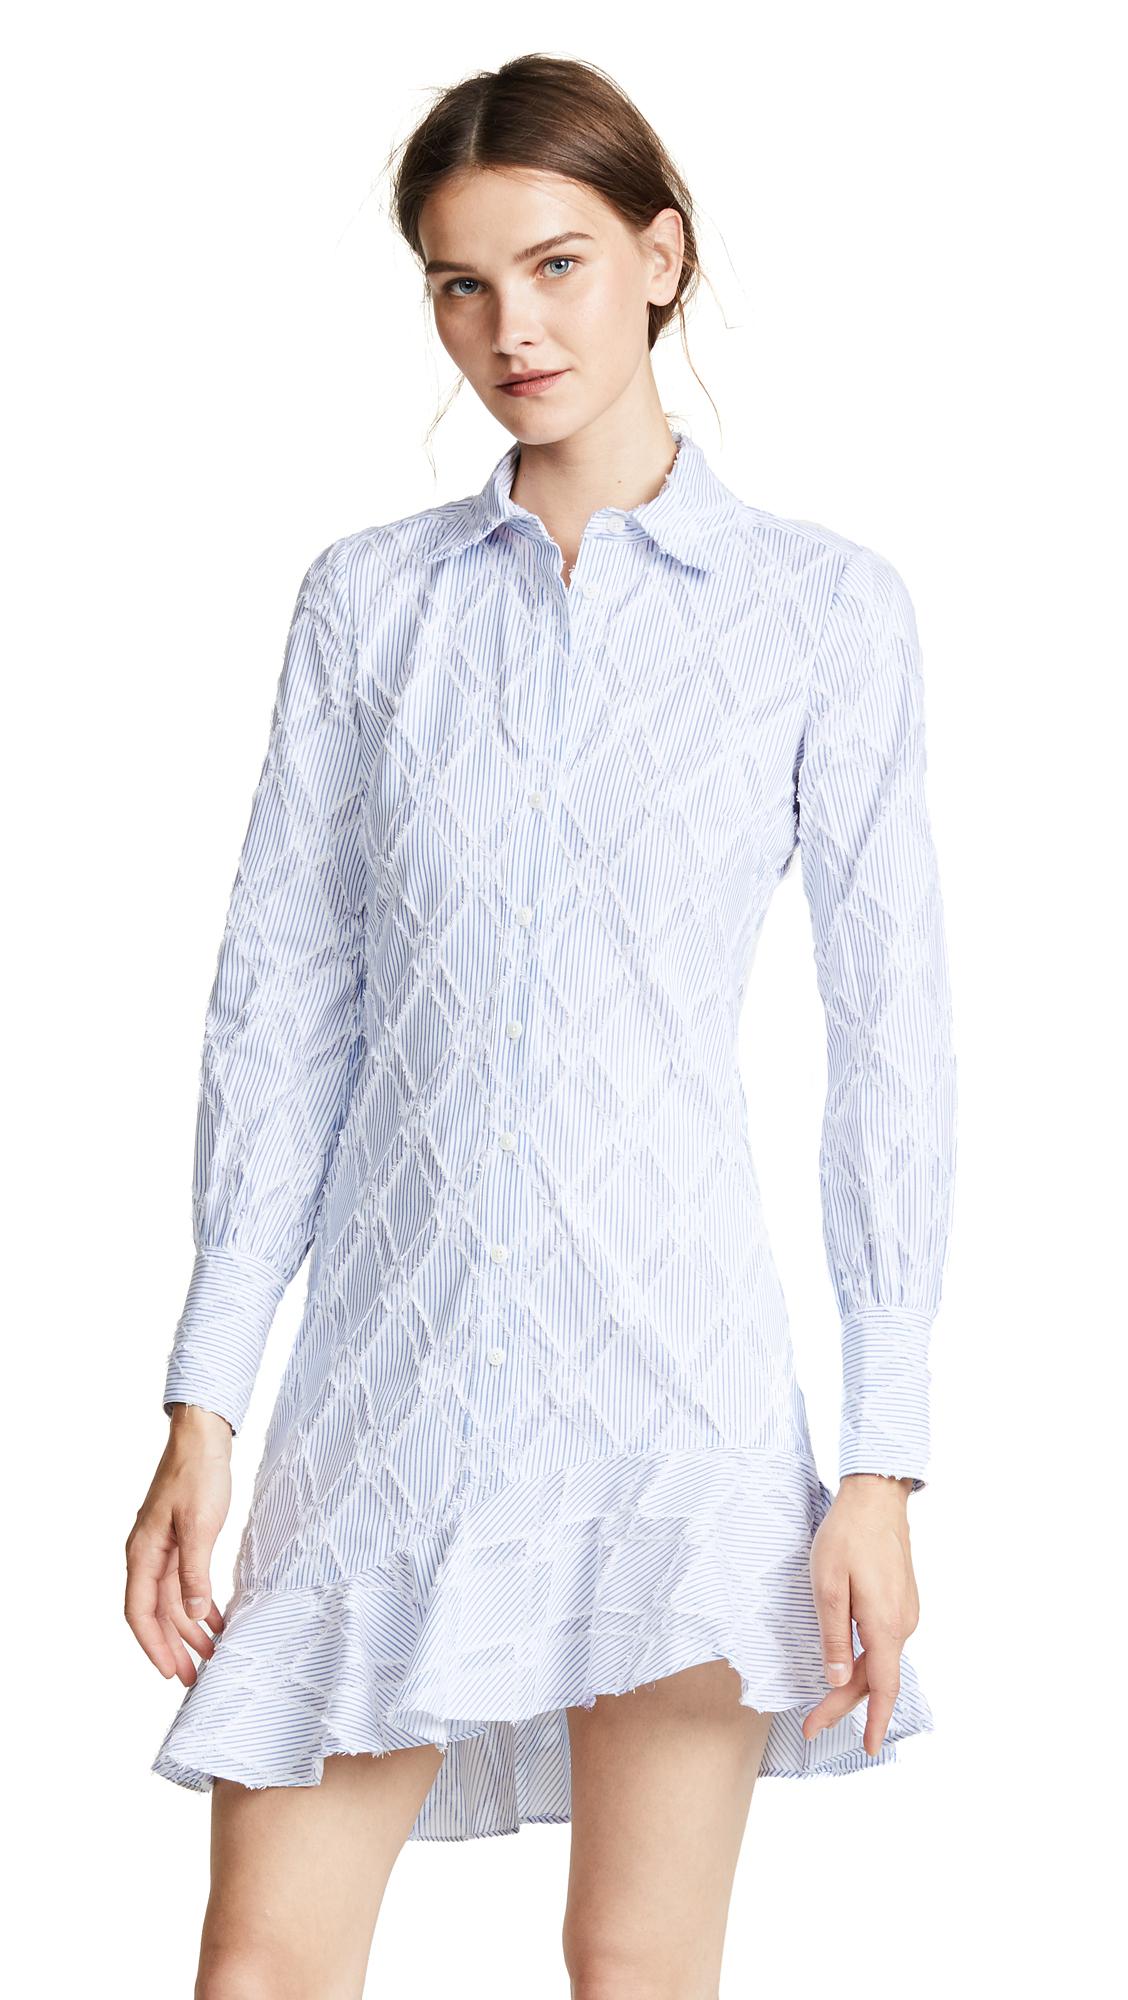 Derek Lam 10 Crosby Shirt Dress With Ruffle Hem